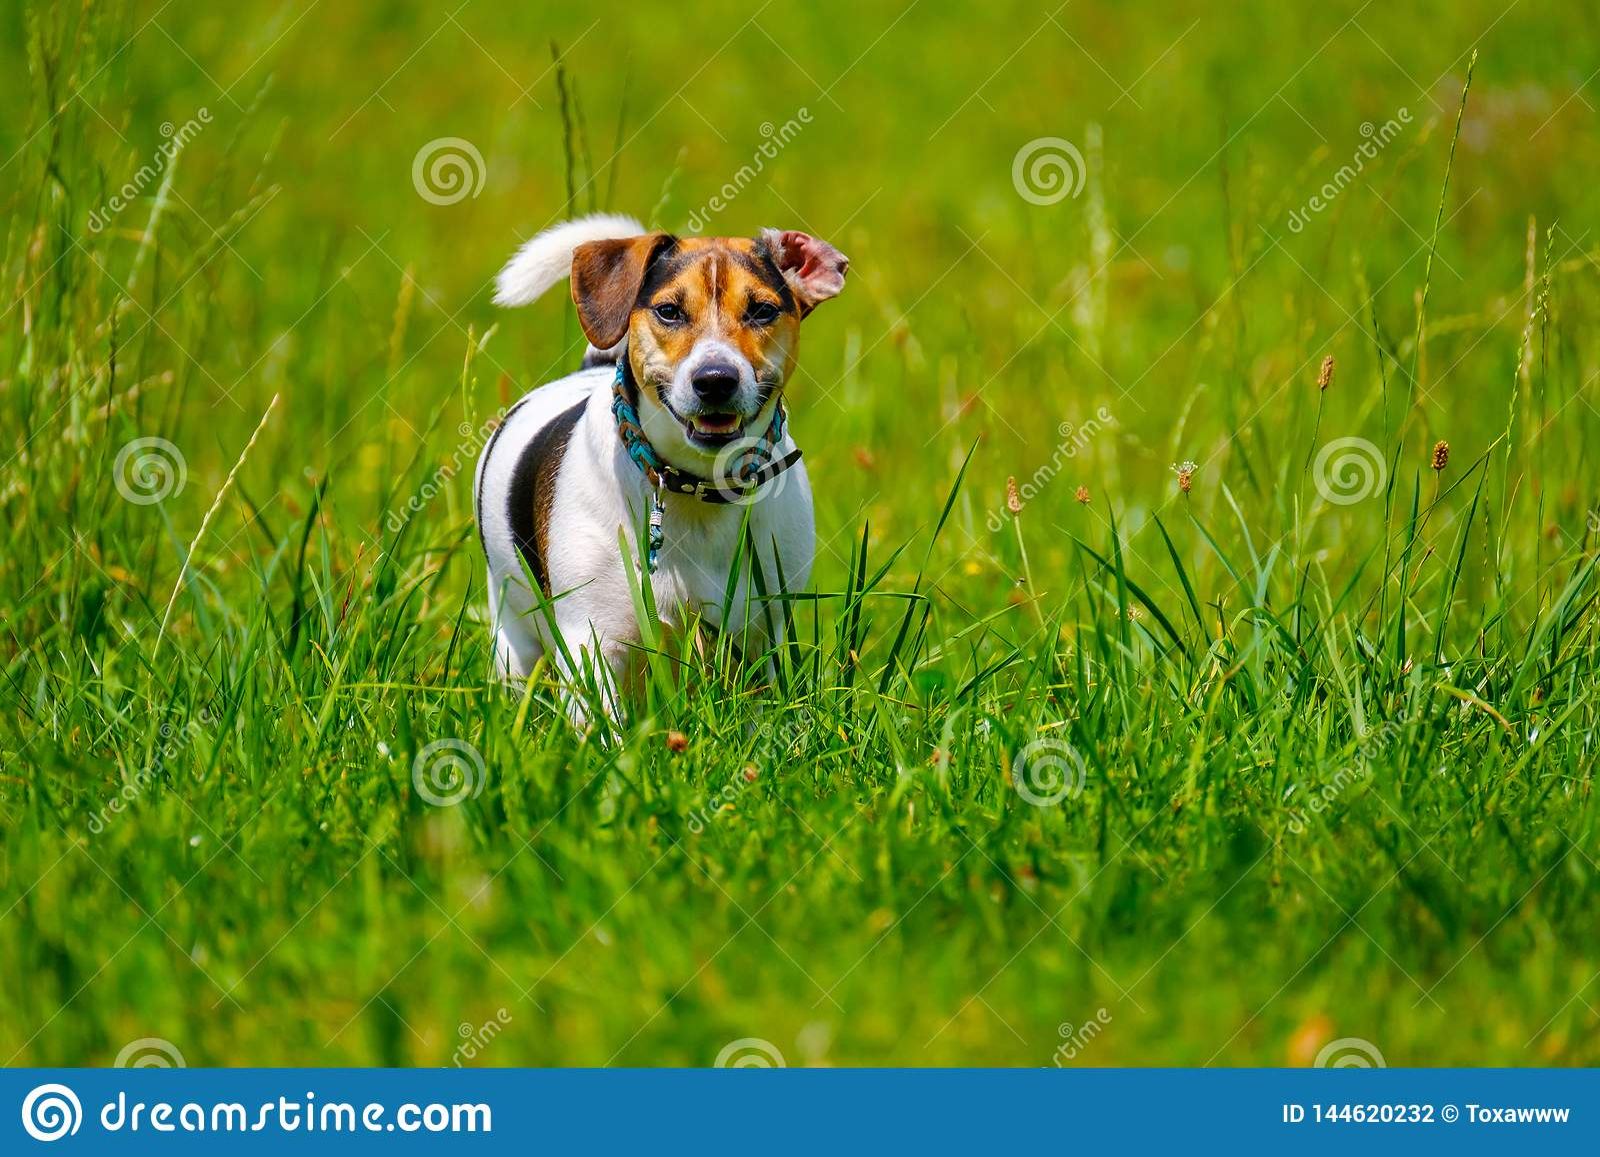 Jack russell terrier walks in the summer